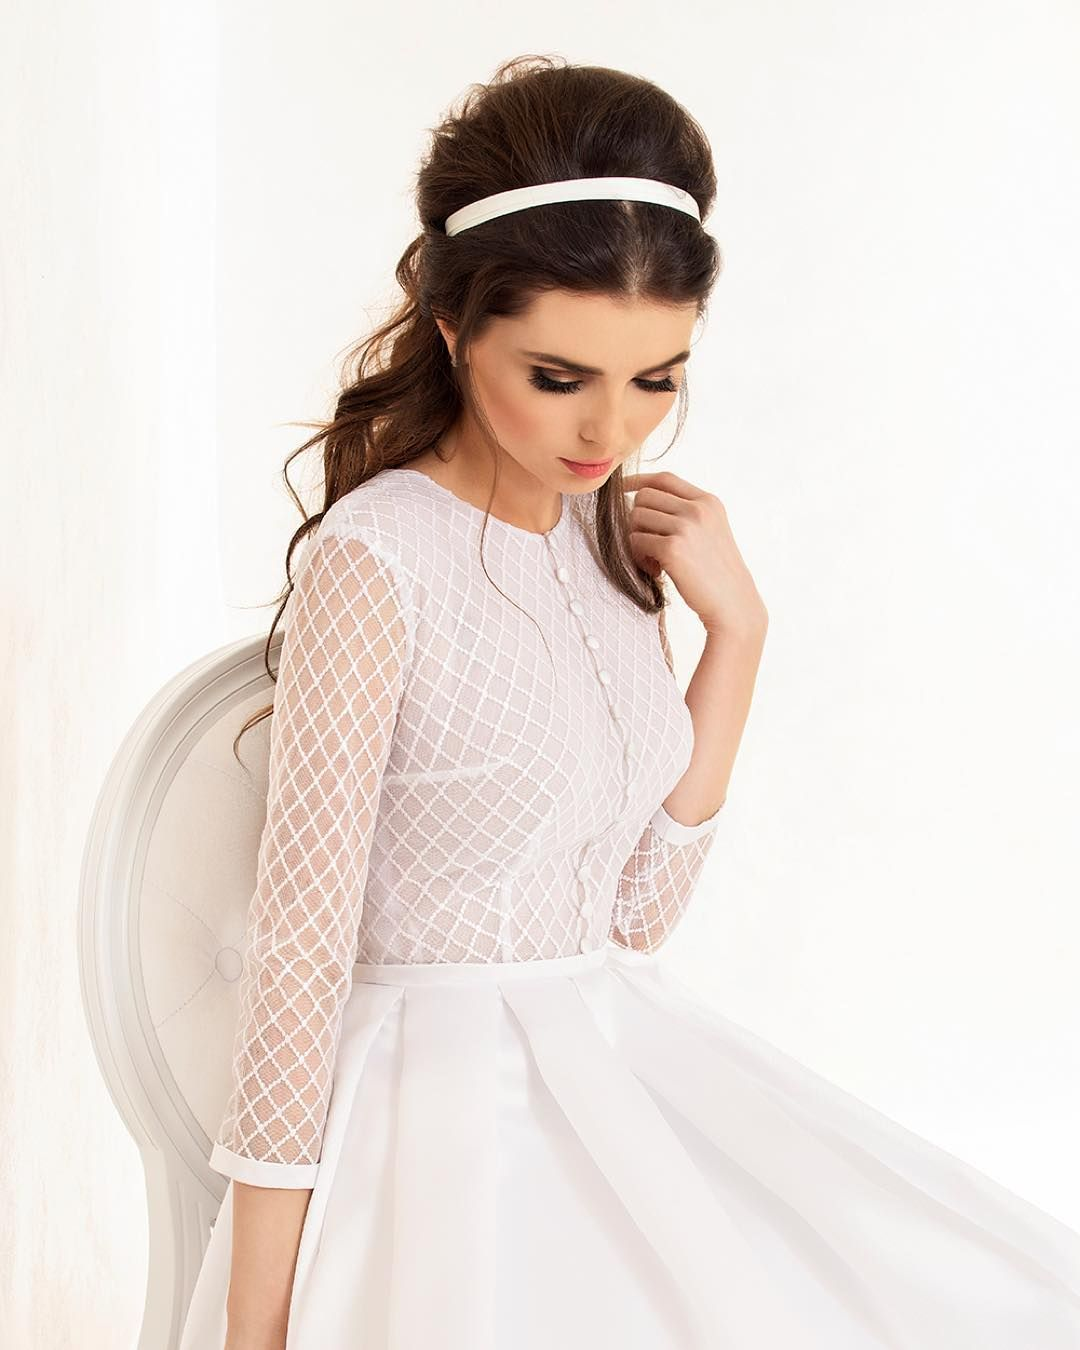 Zaneta Niznikowska On Instagram Bridal 2016 Collection Mywork Photographer Photoshoot Nmstudio Bride Wed Flower Girl Dresses Dresses Wedding Dresses